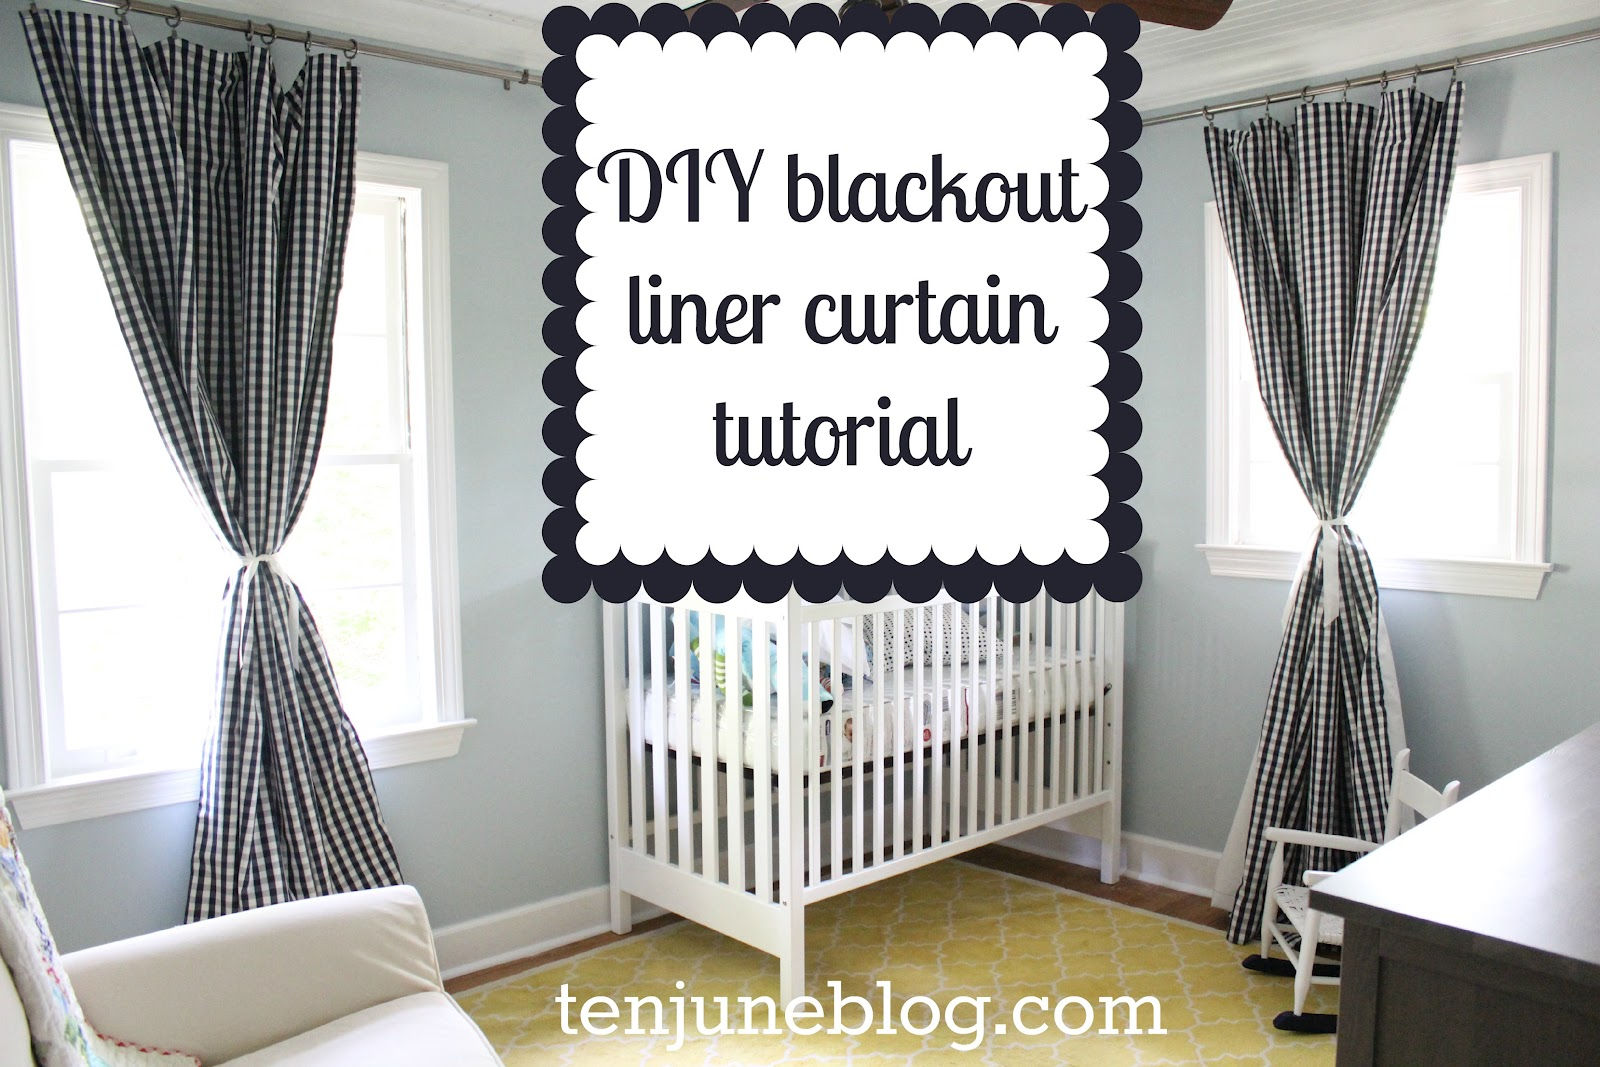 Blackout kitchen curtains photo - 1